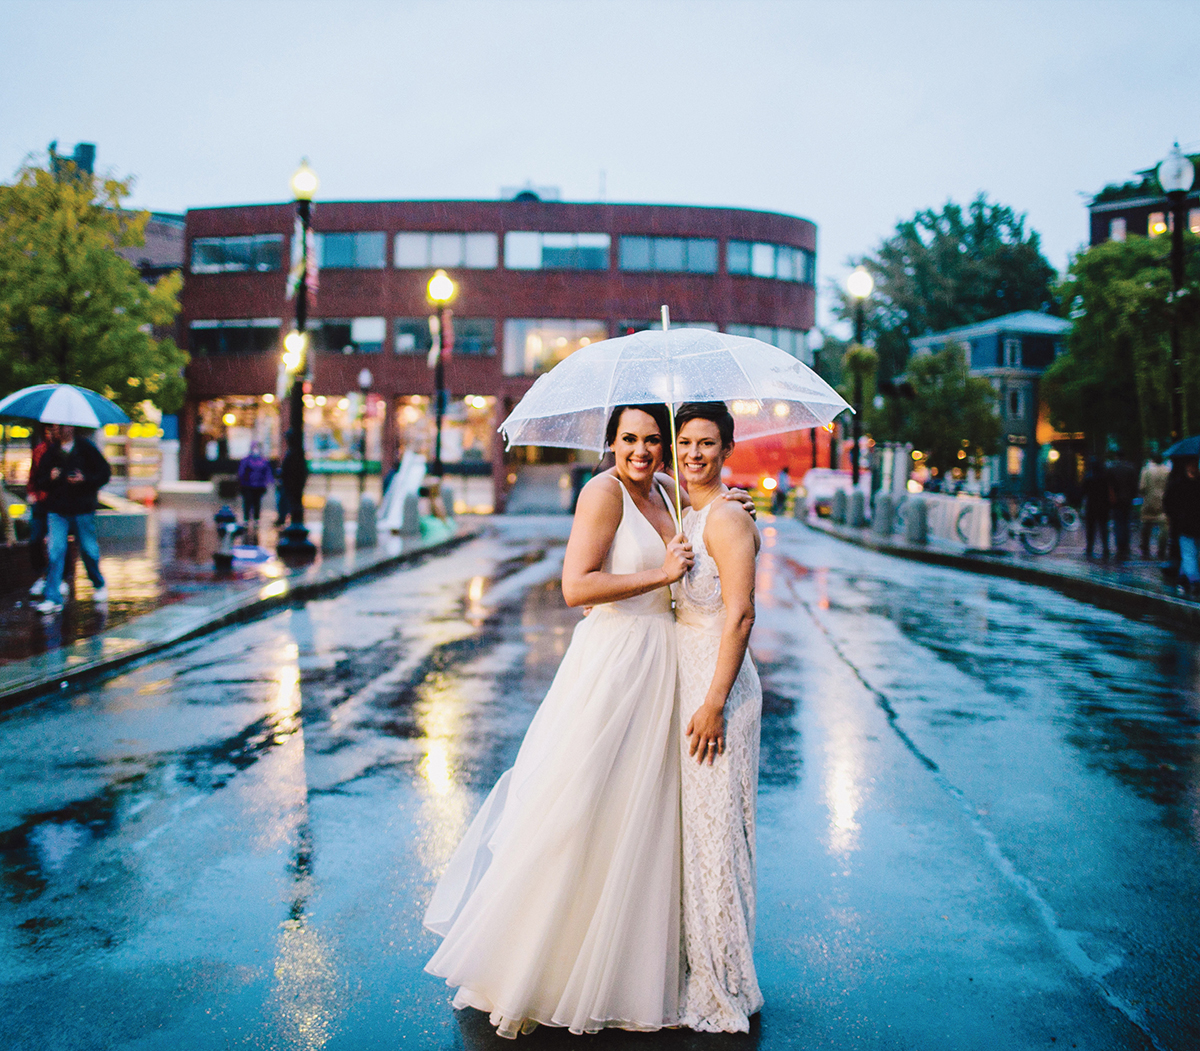 michele truhe whitney yuska wedding photos